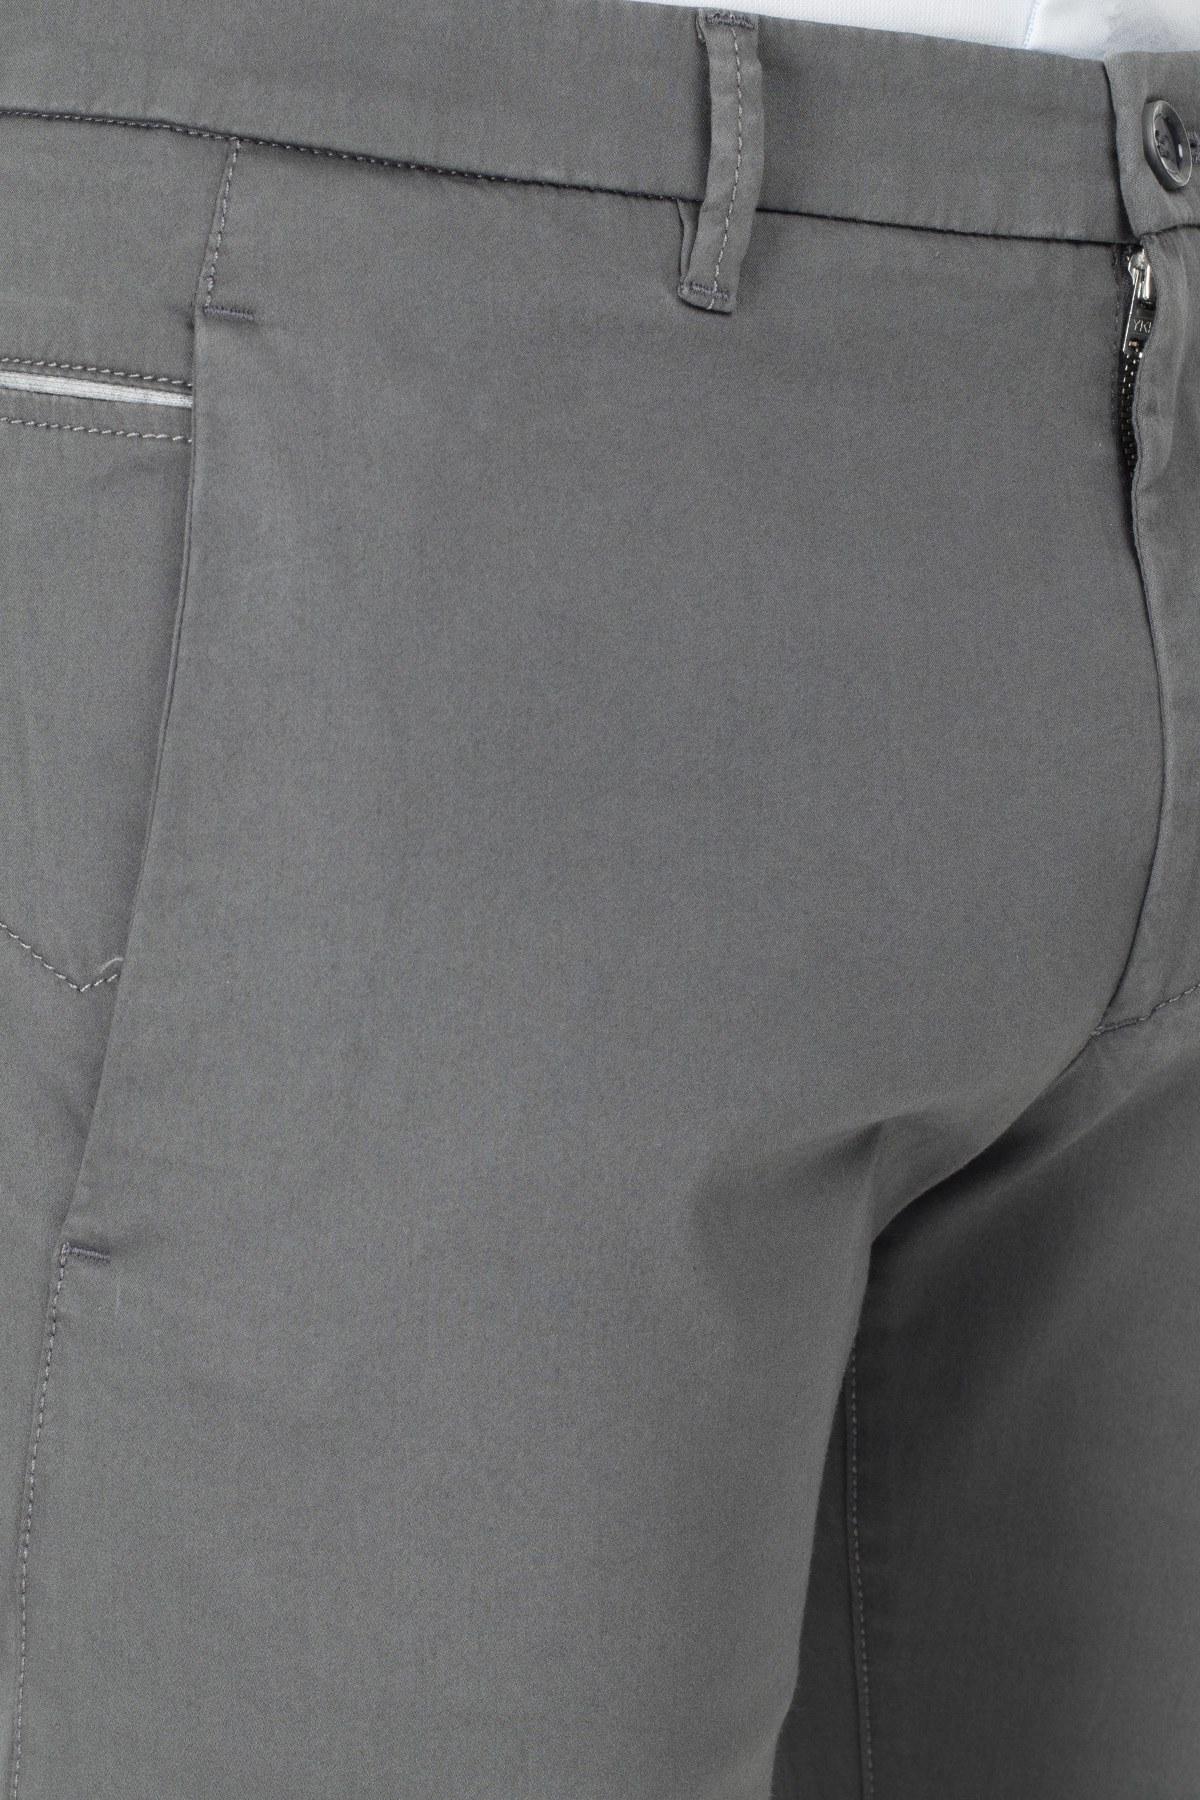 Hugo Boss Erkek Pantolon S 50378292 031 GRİ